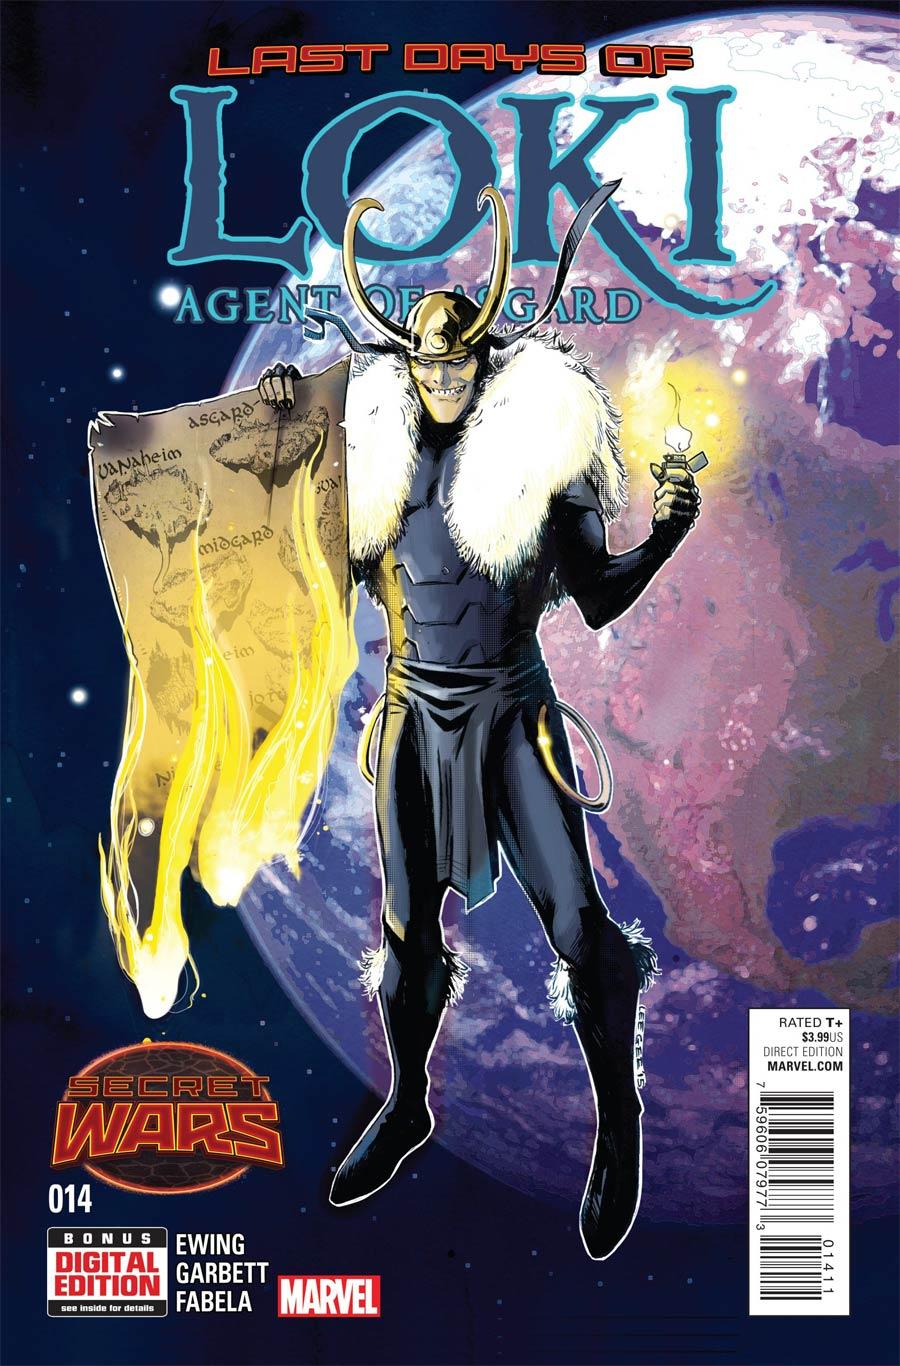 Loki Agent Of Asgard #14 (Secret Wars Last Days Tie-In)